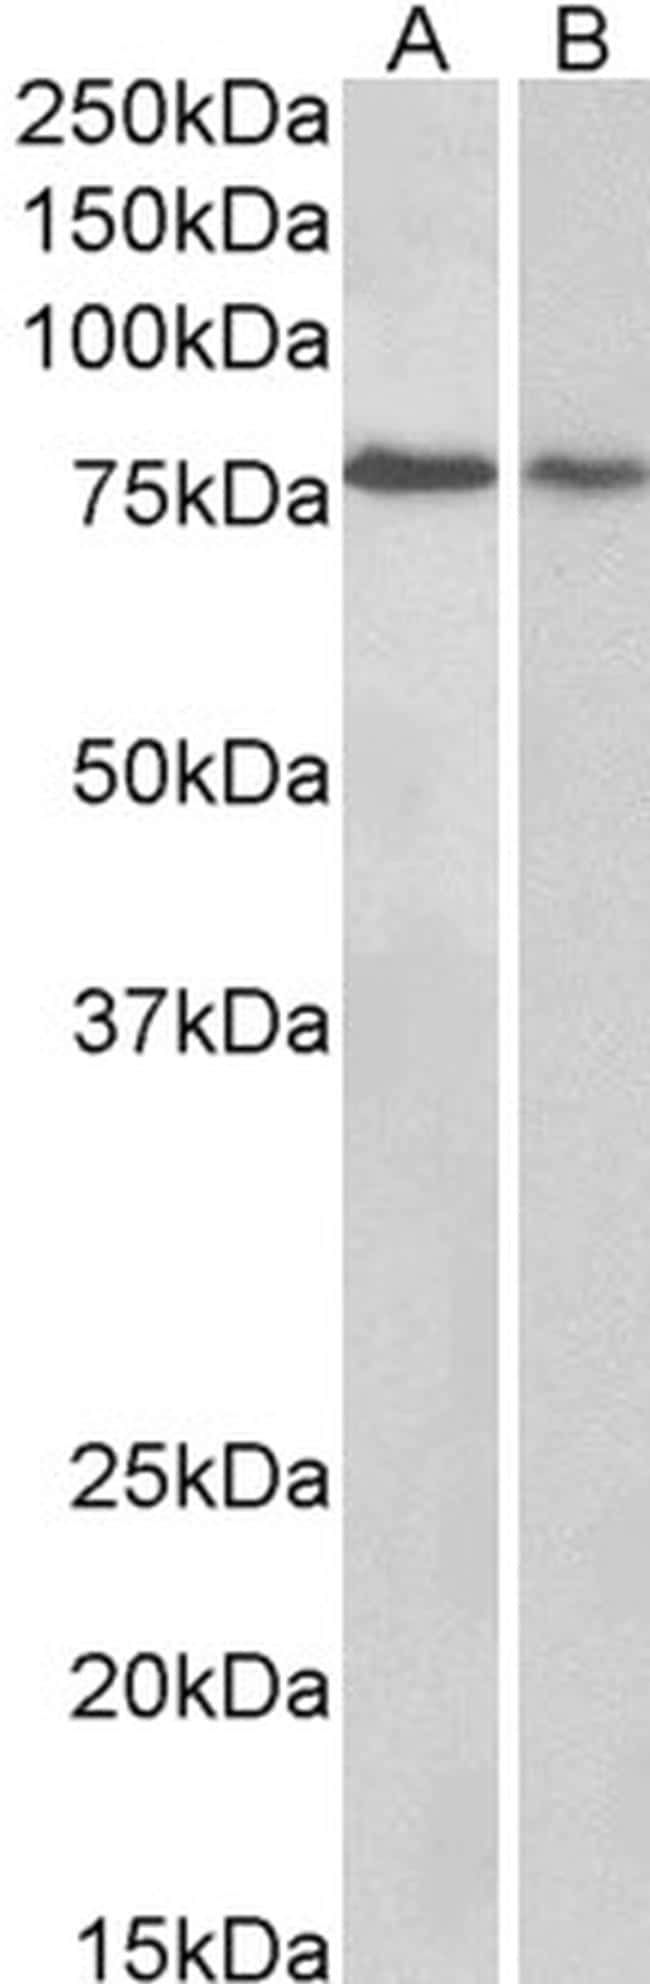 BERP Antibody in Western Blot (WB)